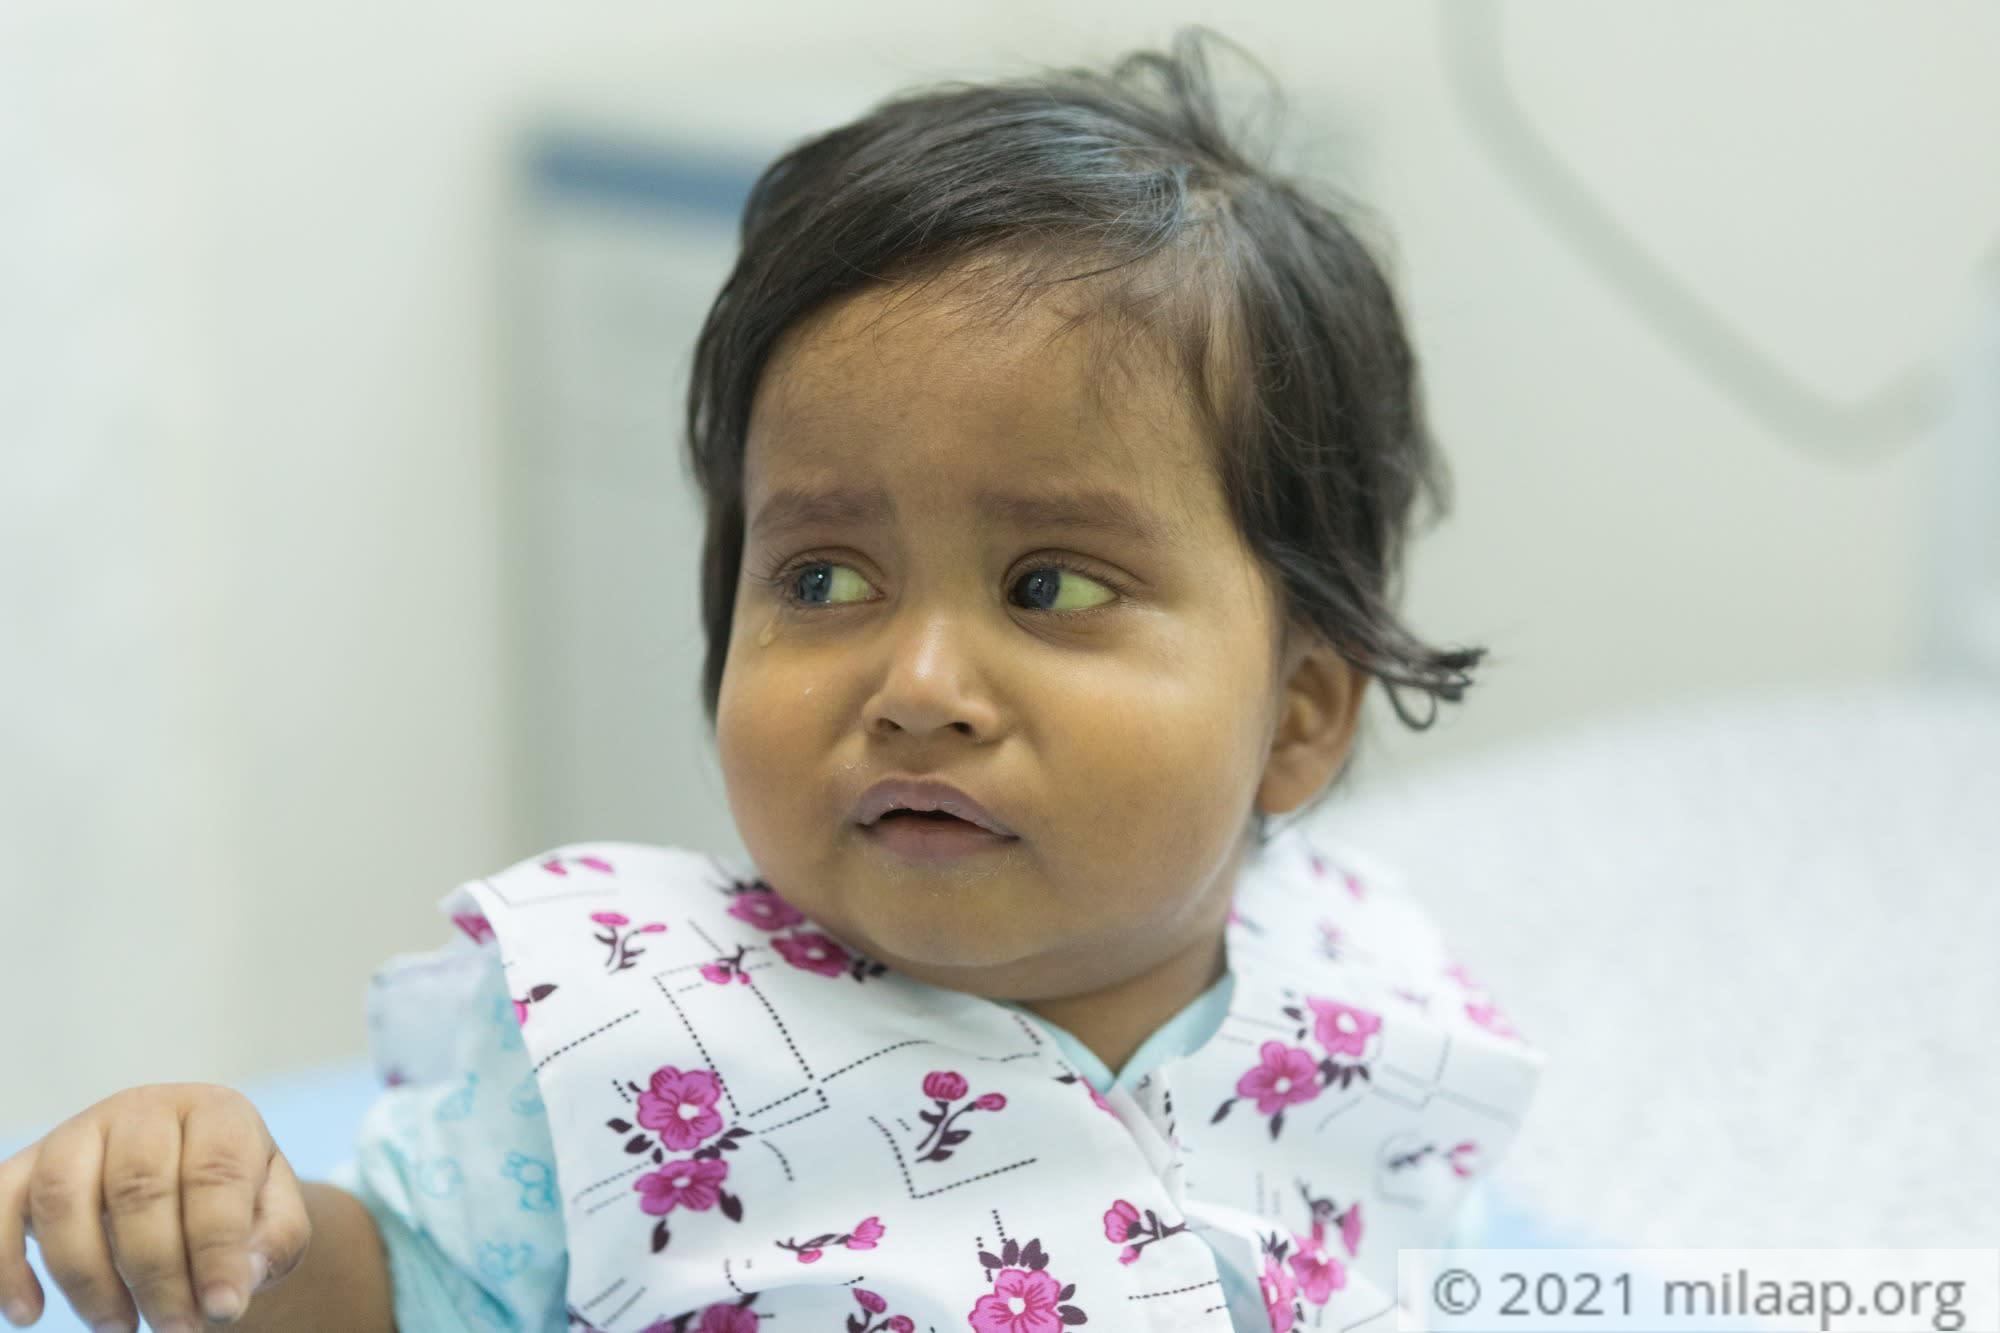 Shivansh 1 anqnnc 1575640892